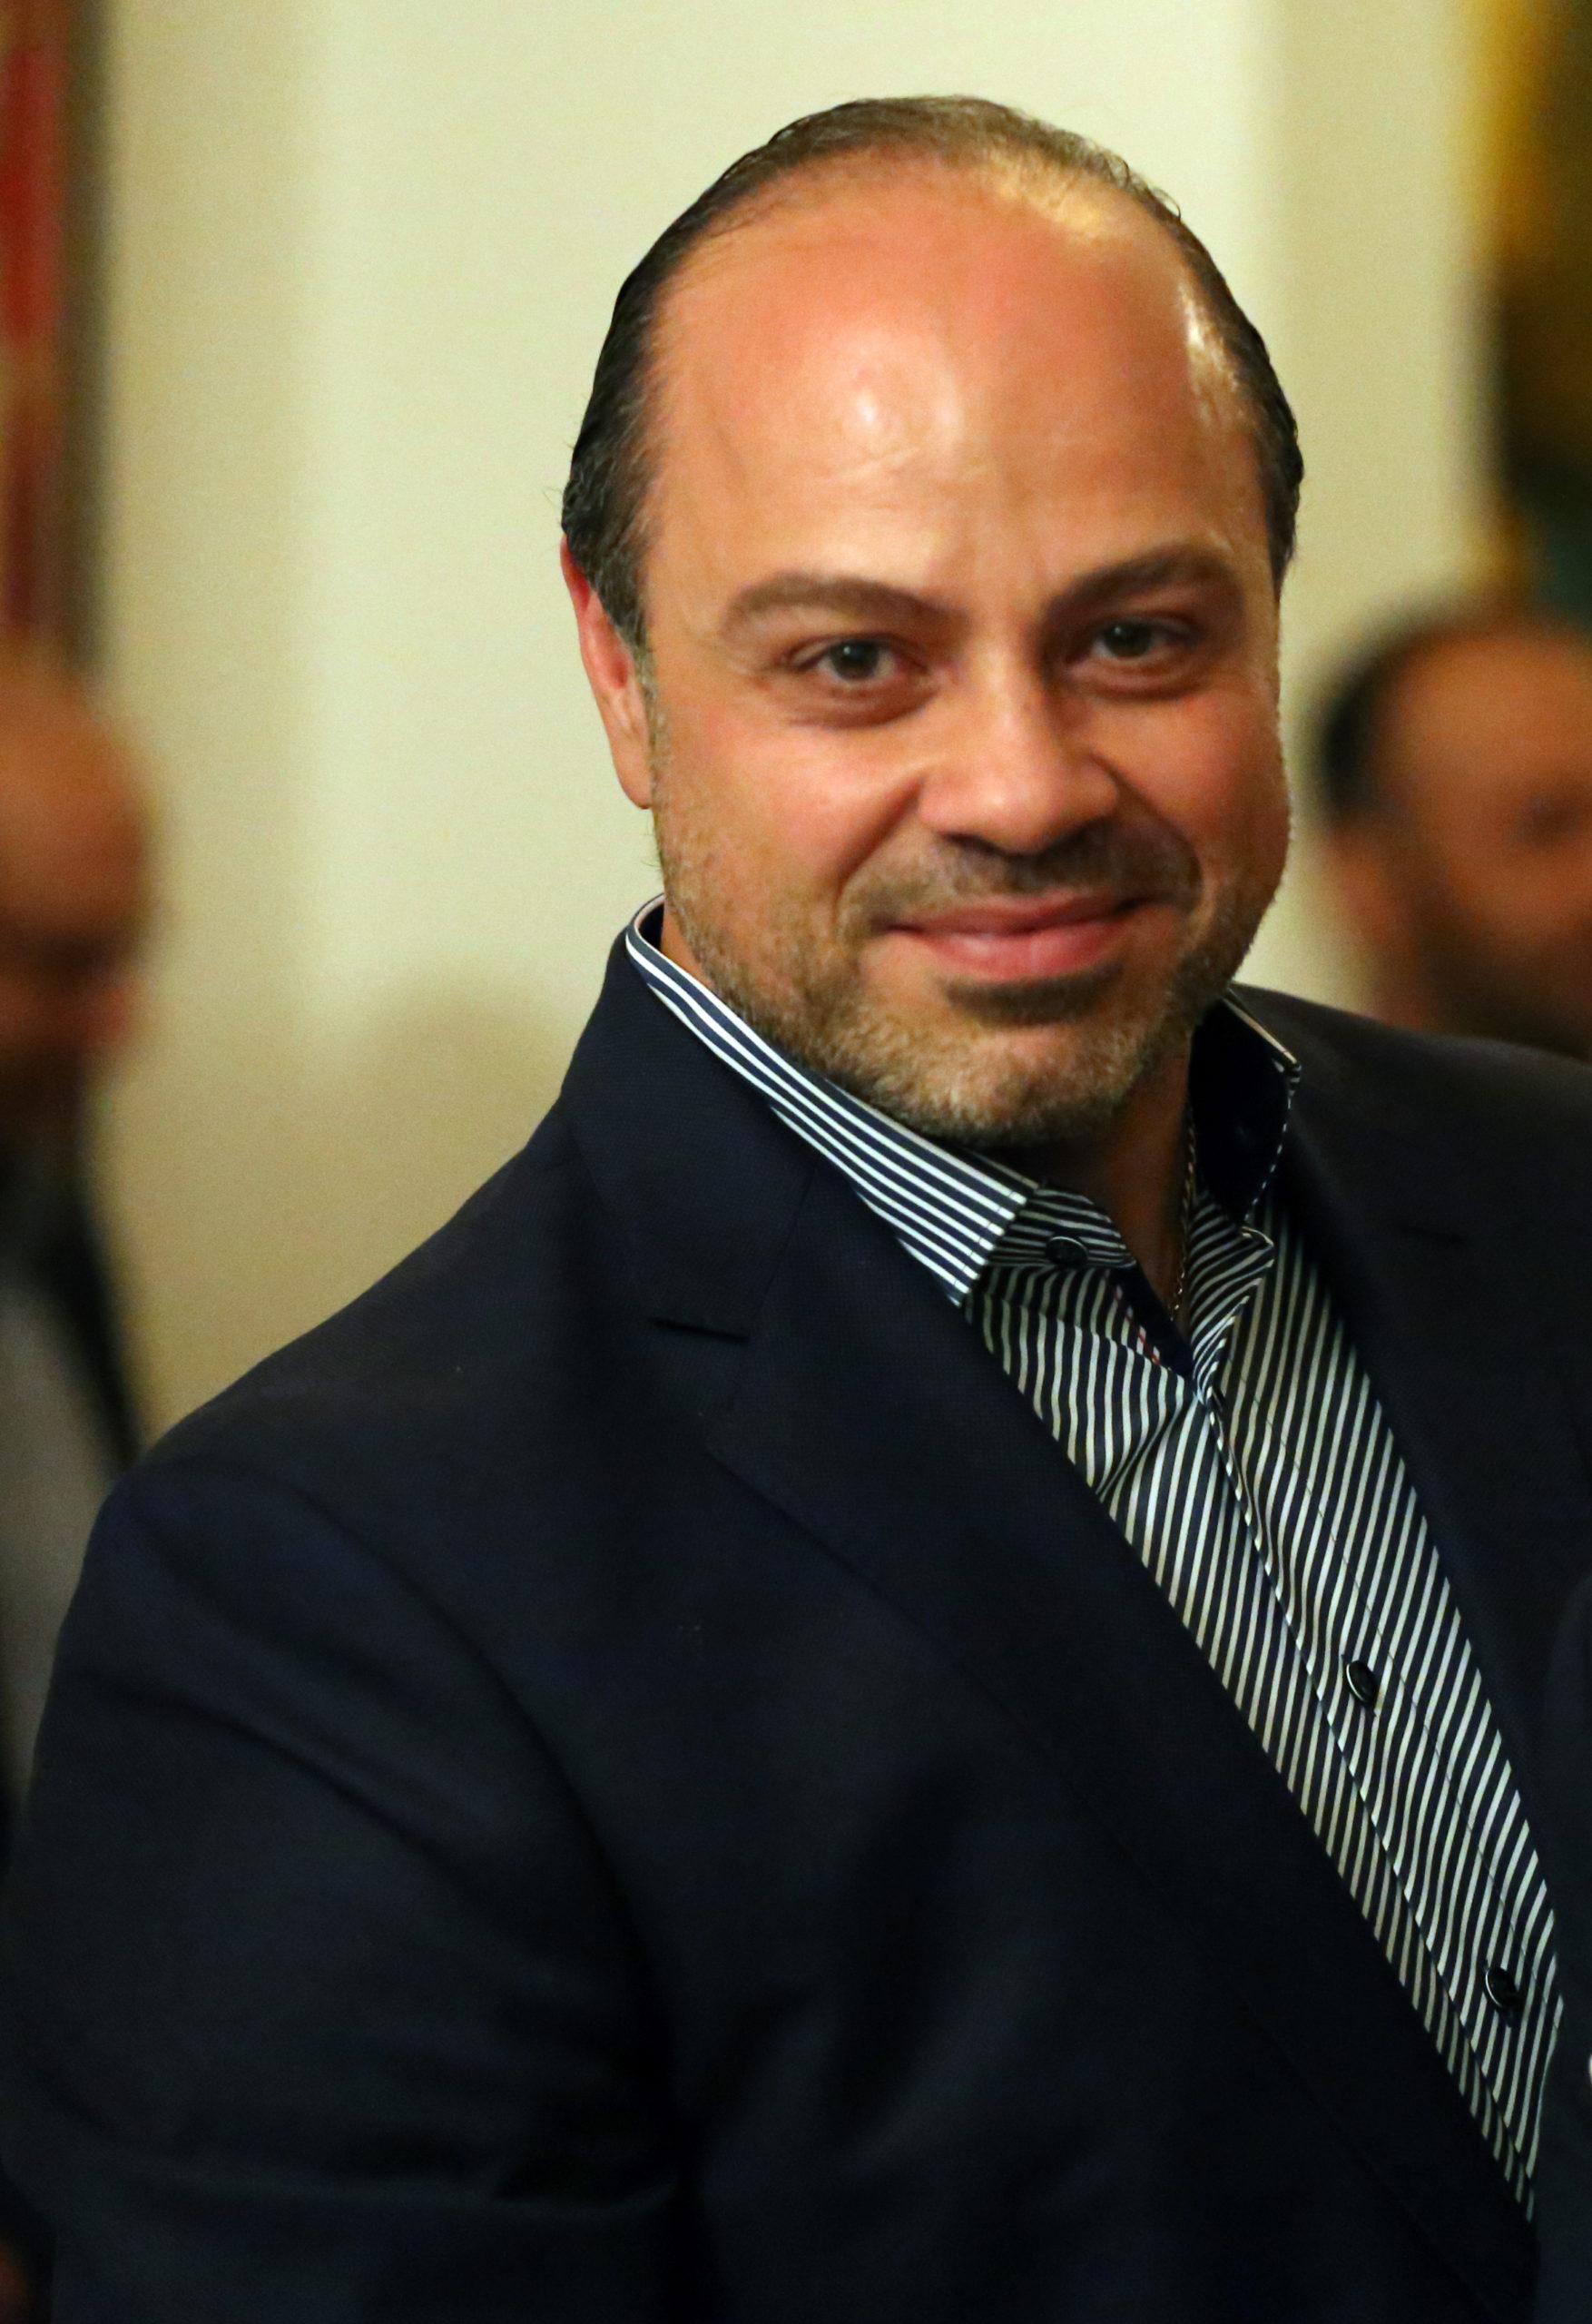 Ibrahim Osta, Chemonics International, DC, USA